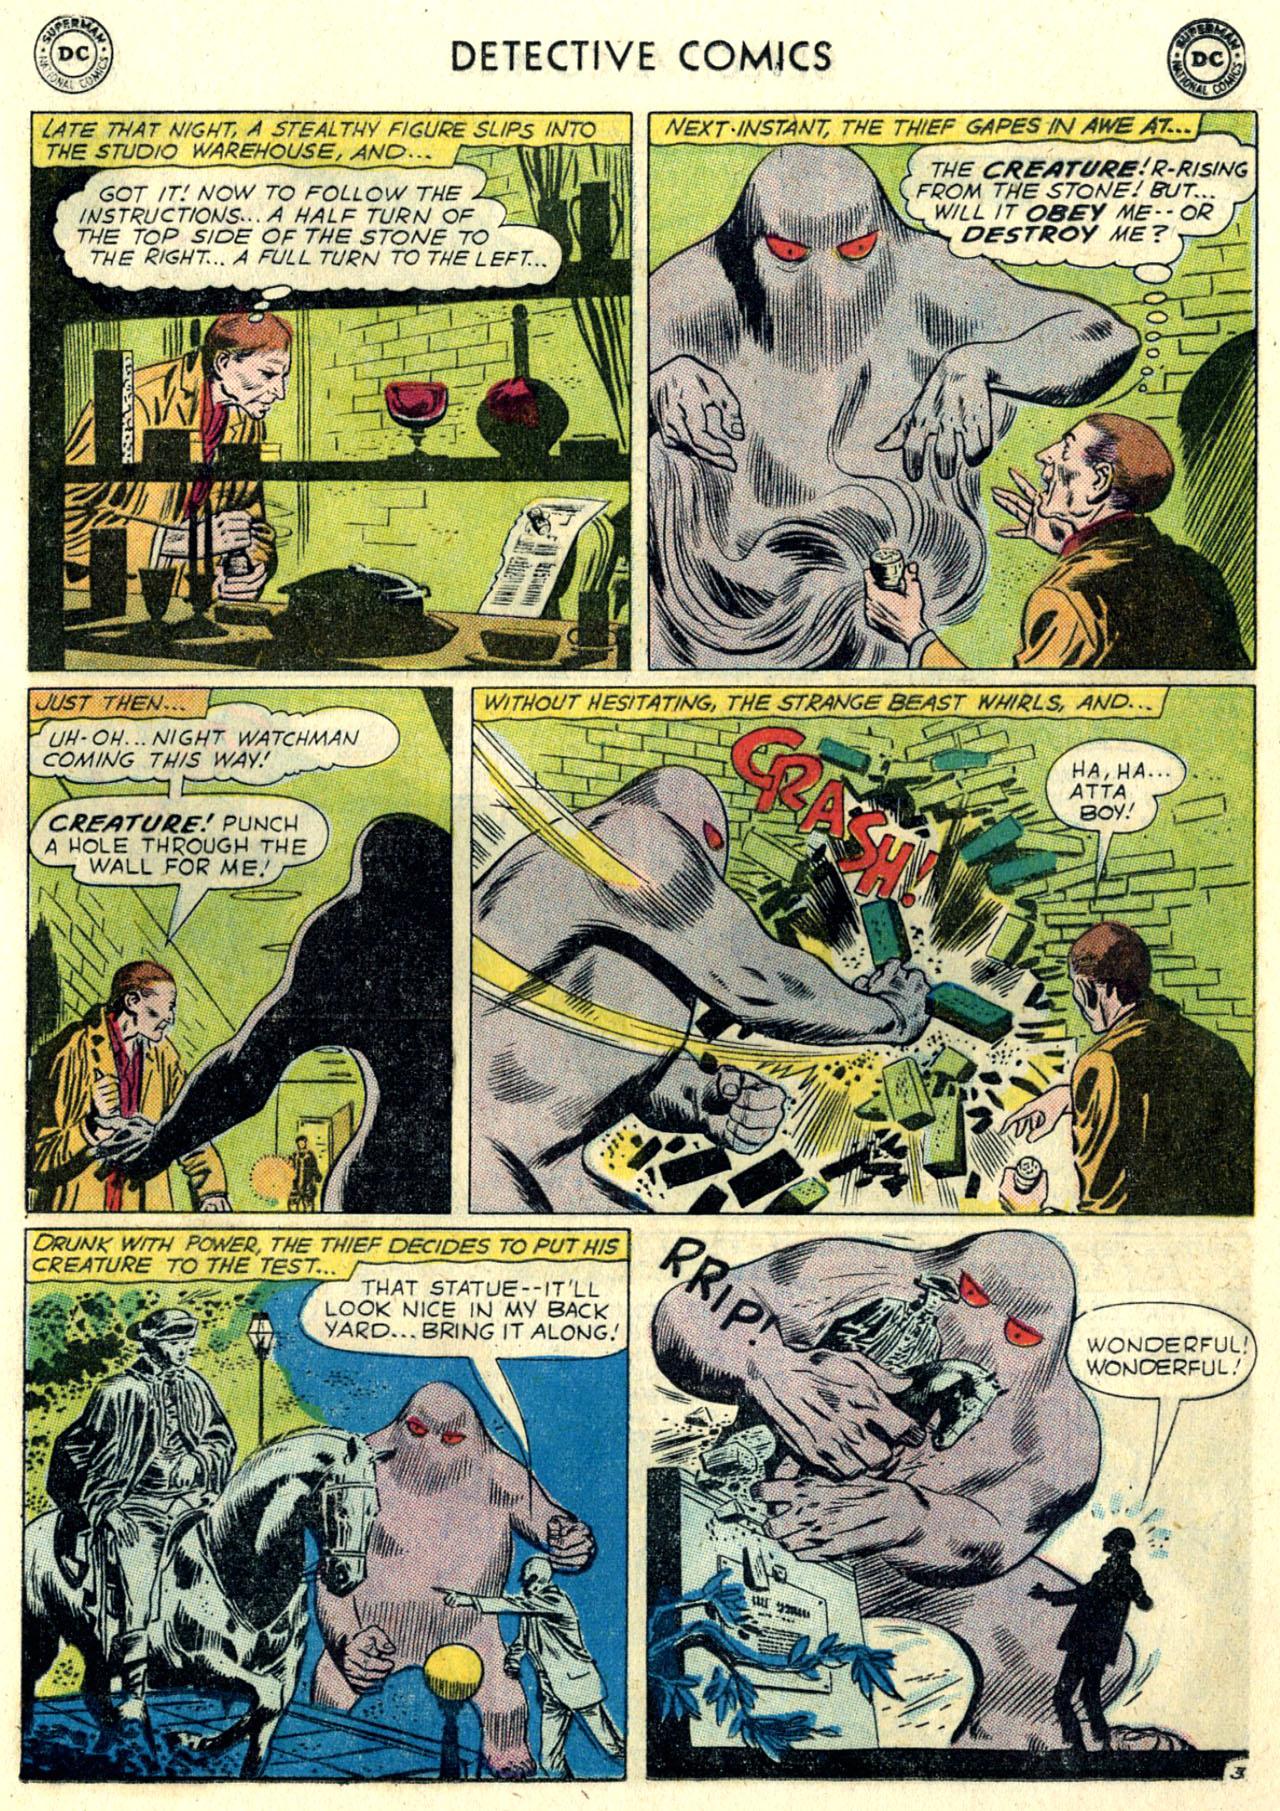 Detective Comics (1937) 279 Page 28